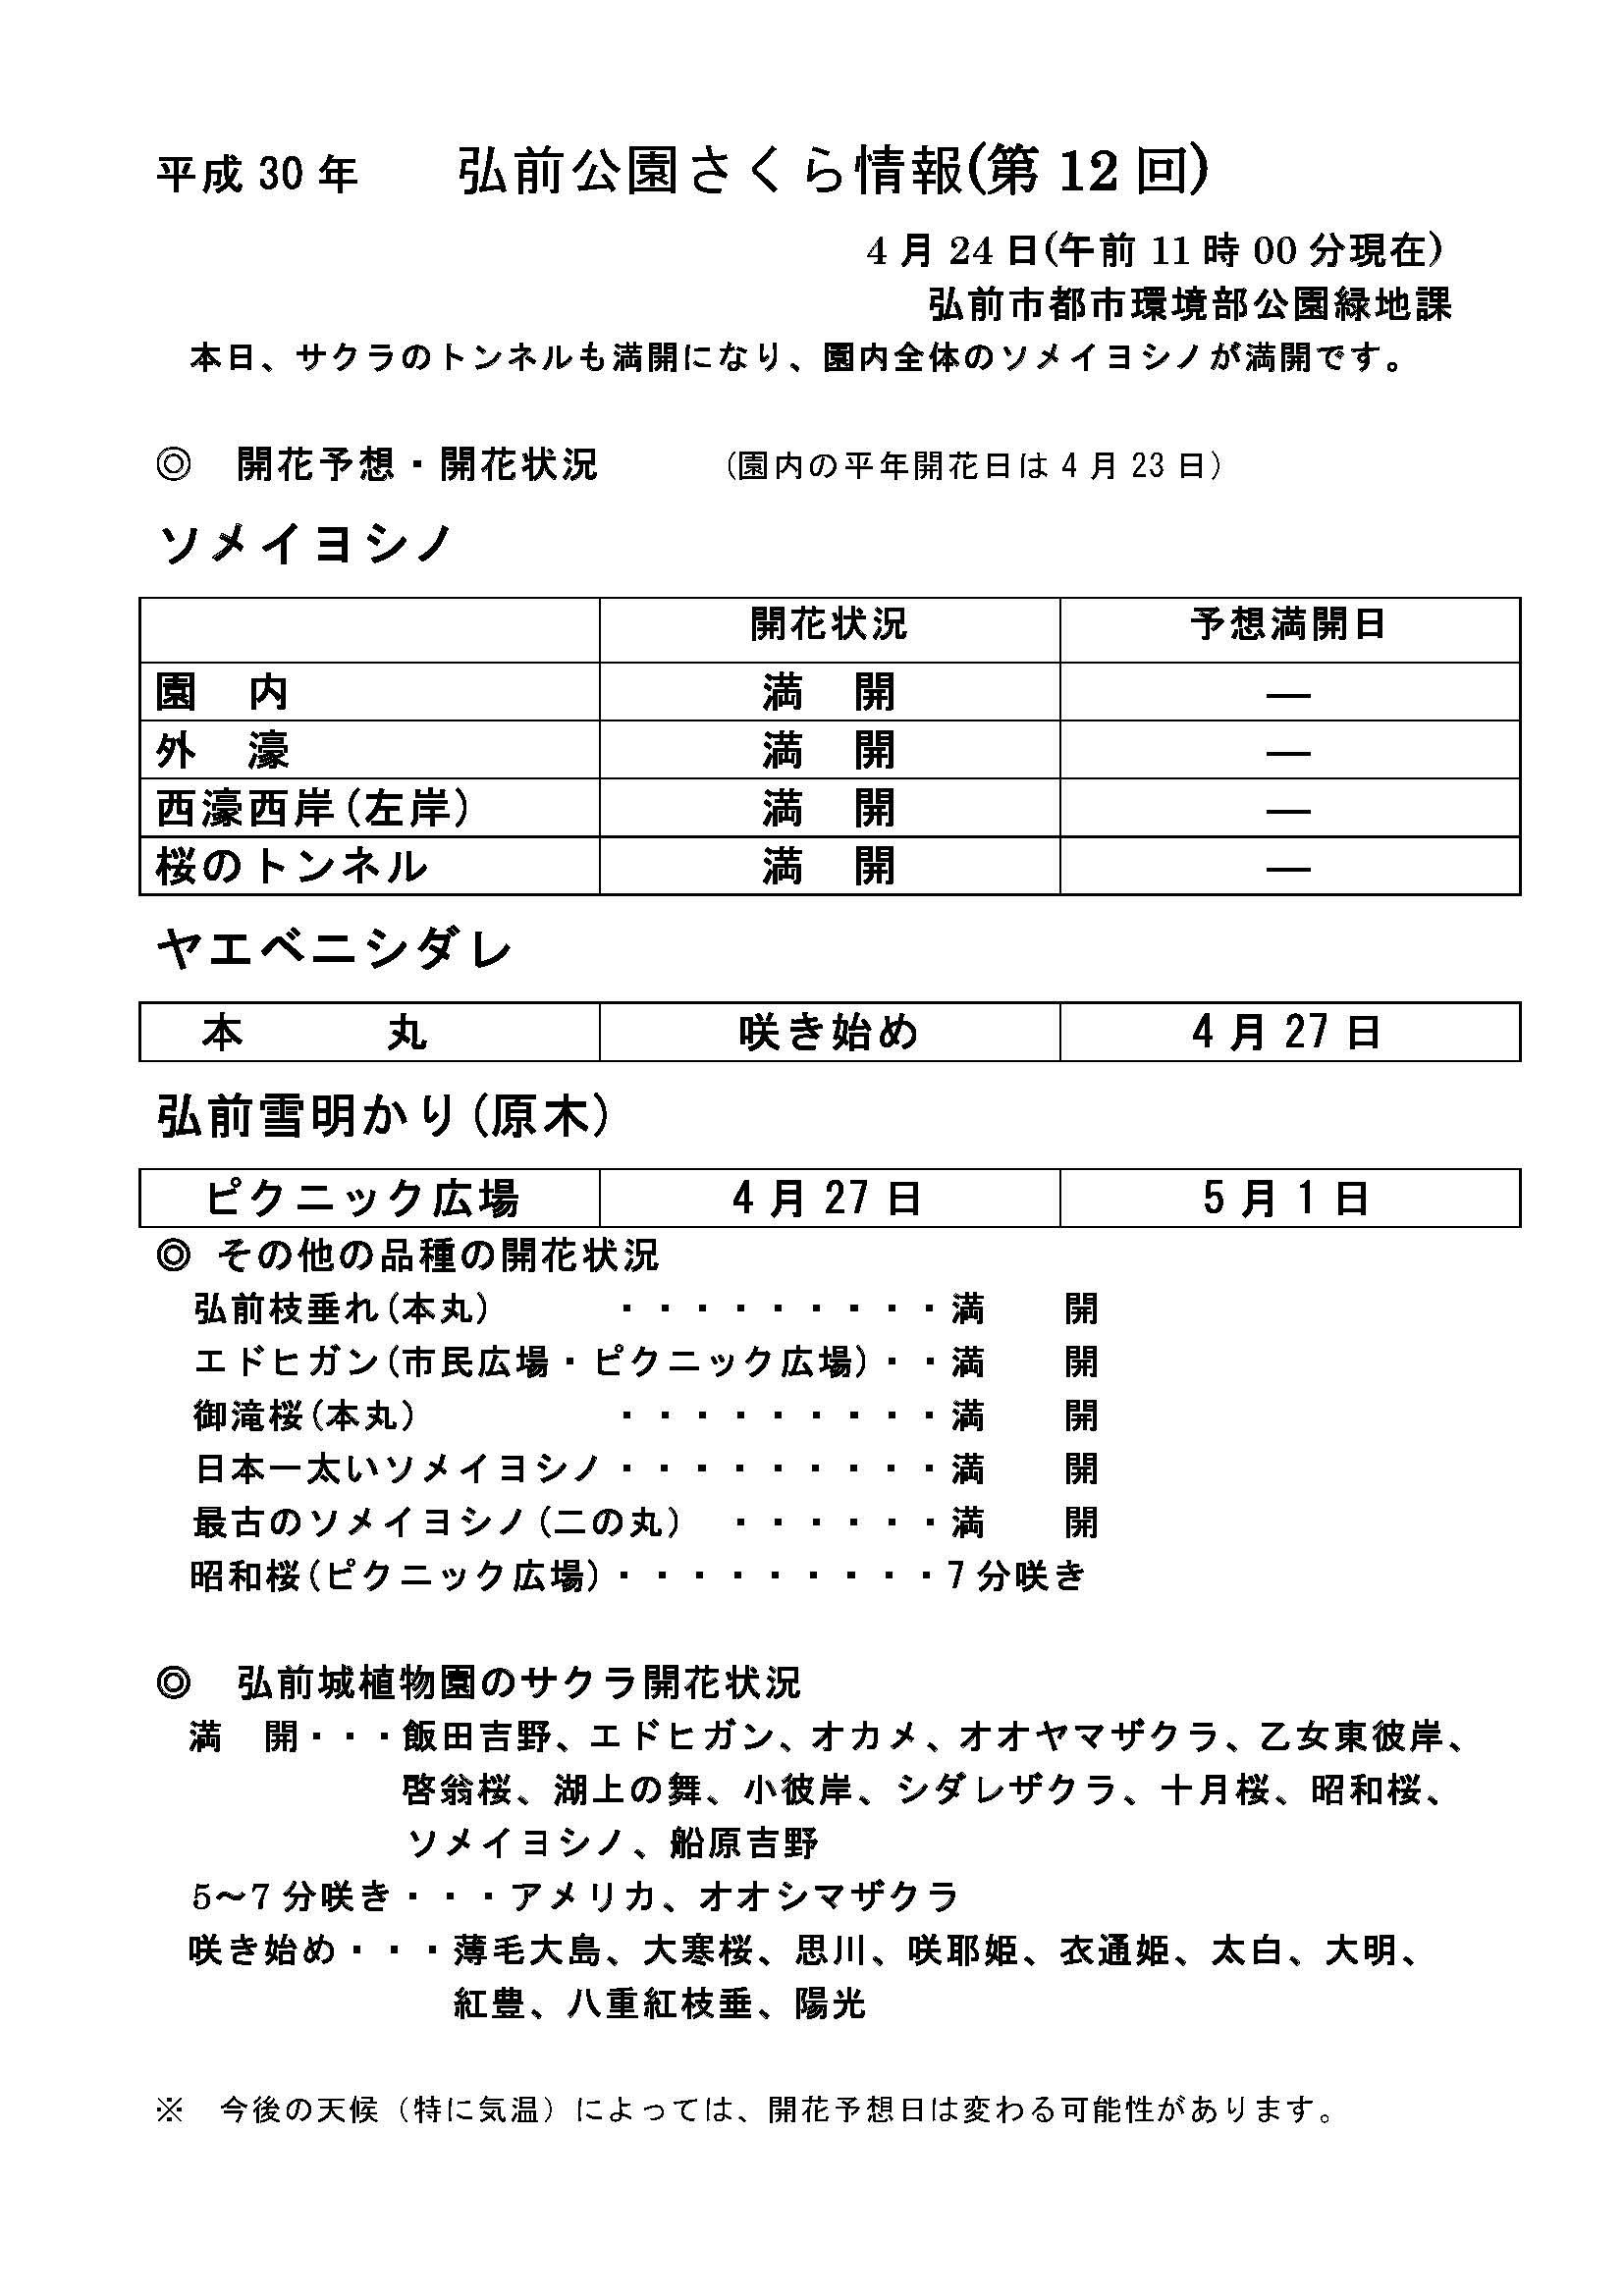 2018年4月24日付 弘前公園さくら情報(第10回)【弘前公園・弘前城】